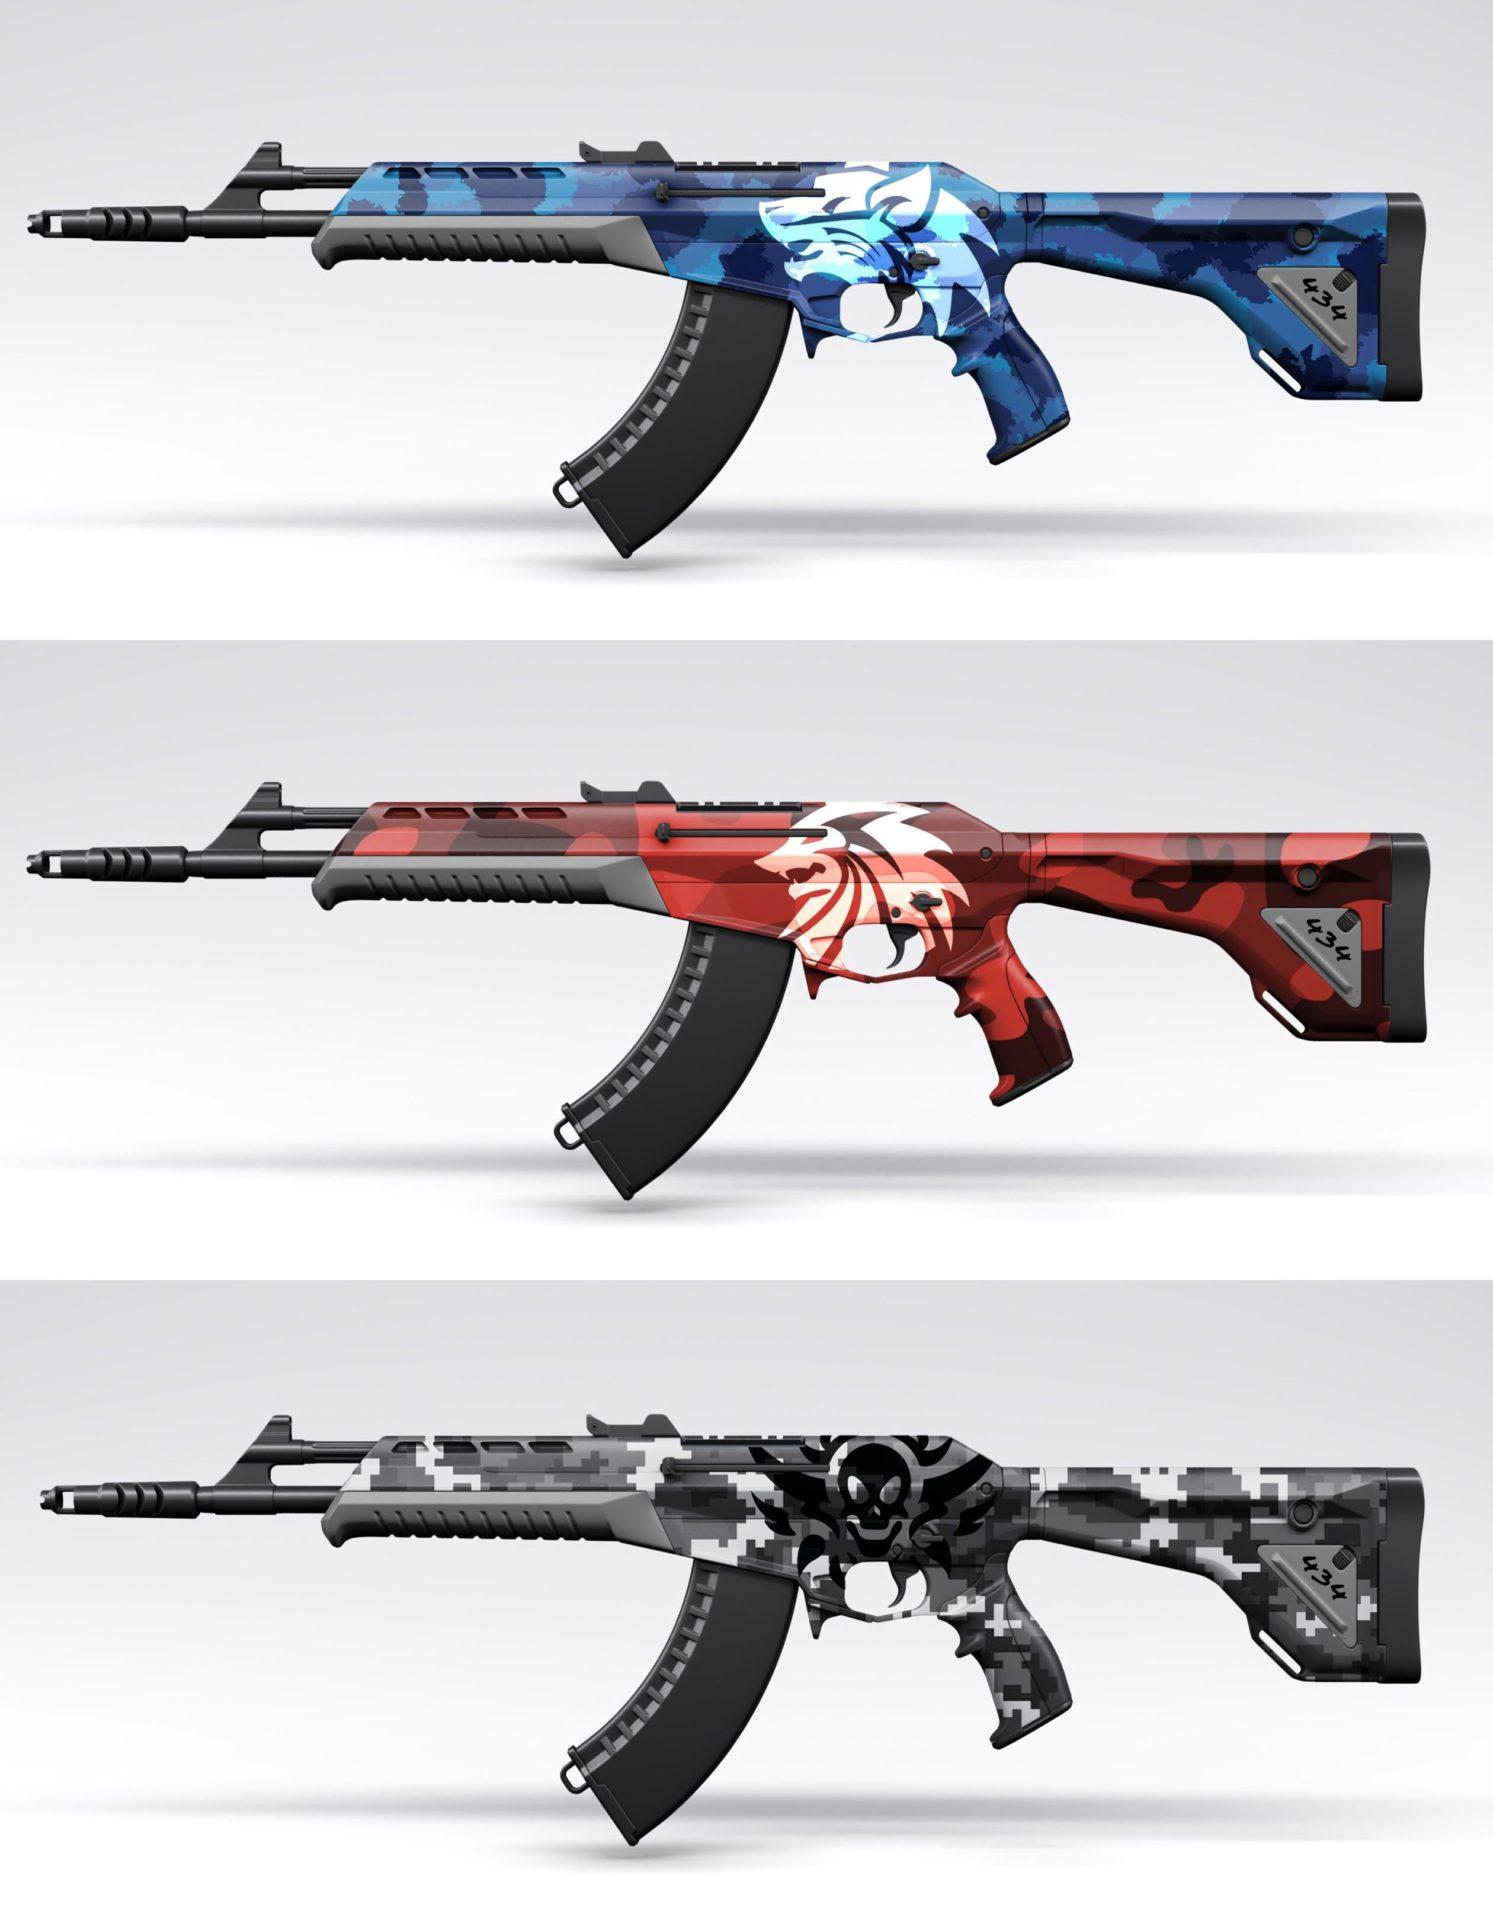 Variants for RivalRudra skins